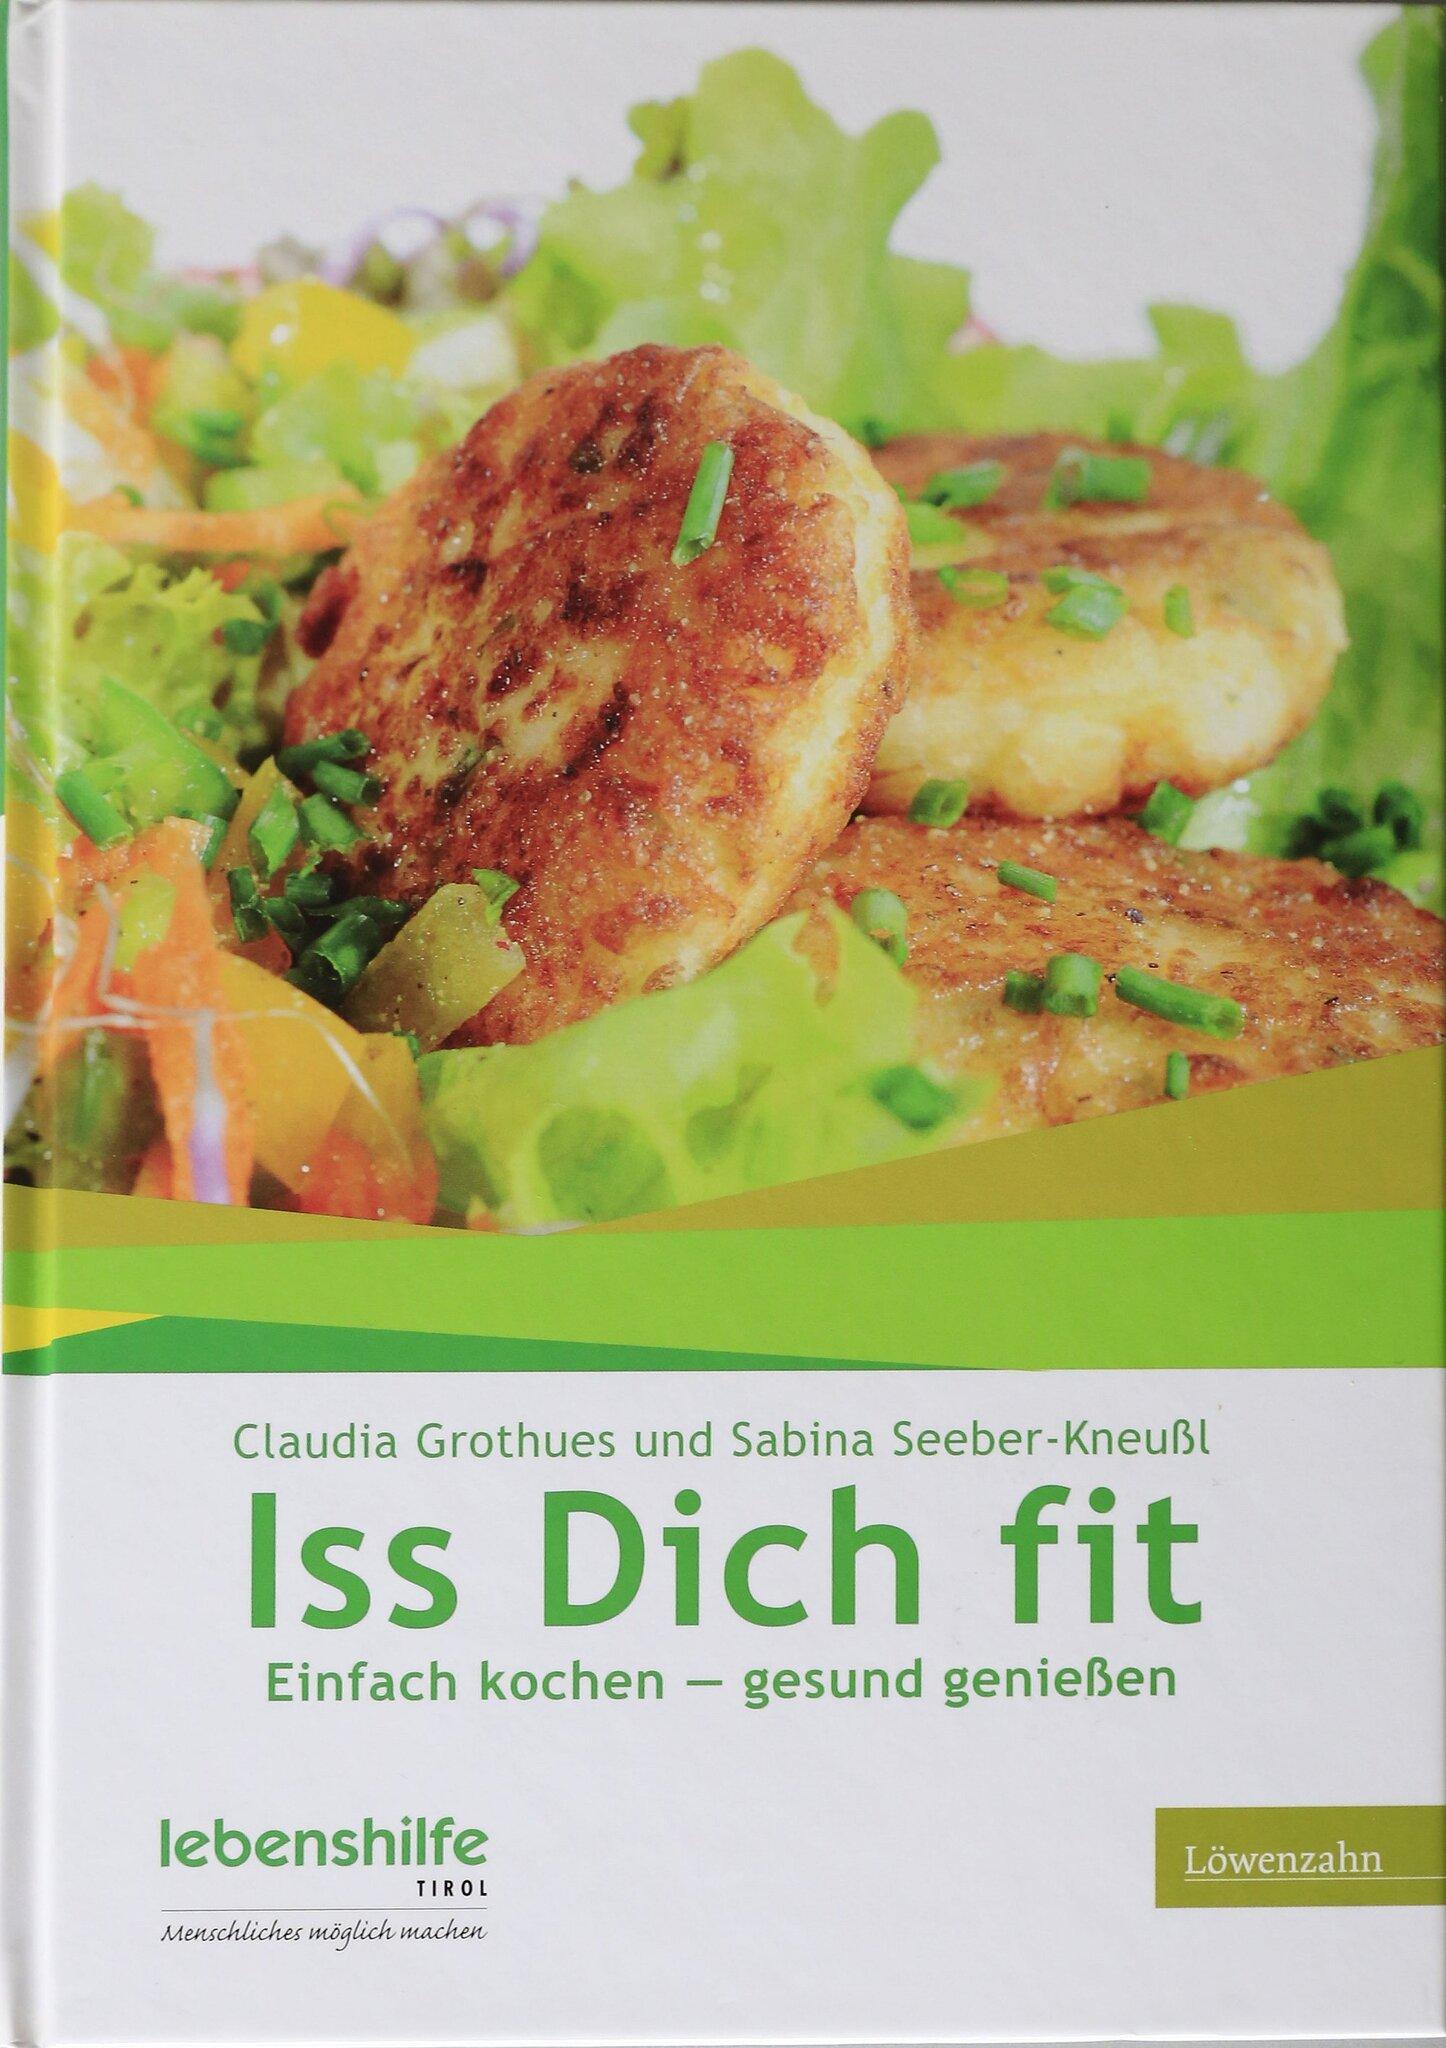 Lebenshilfe-pr-sentiert-Kochbuch-und-Kalender